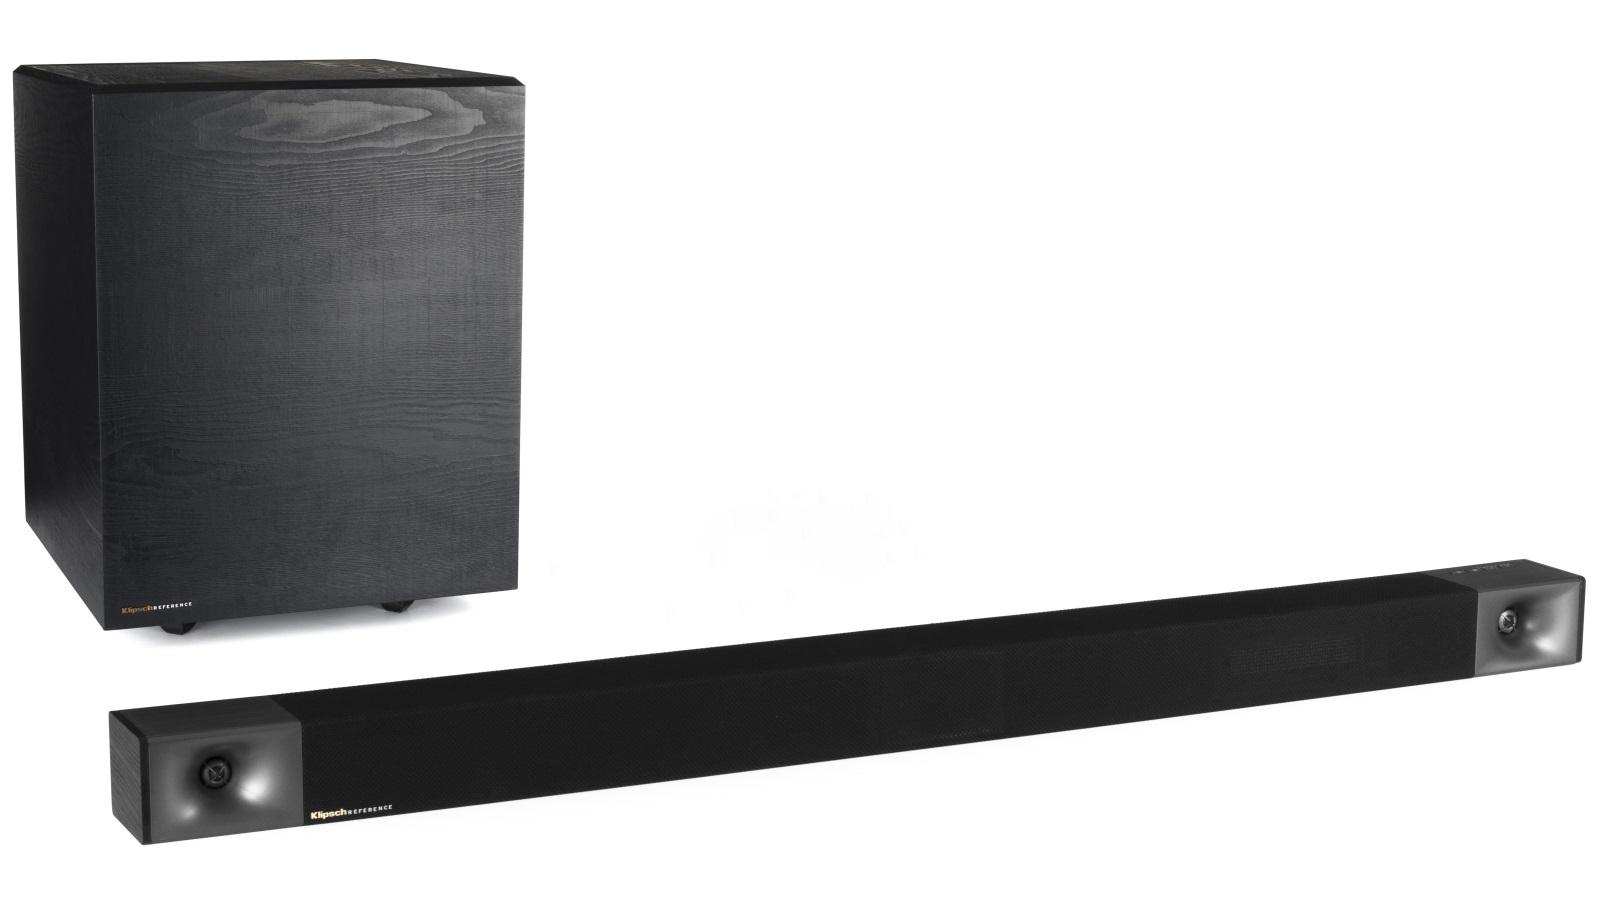 Image of Klipsch Cinema 800 48-inch 3.1-Channel Dolby Atmos Soundbar with 10-inch Wireless Subwoofer